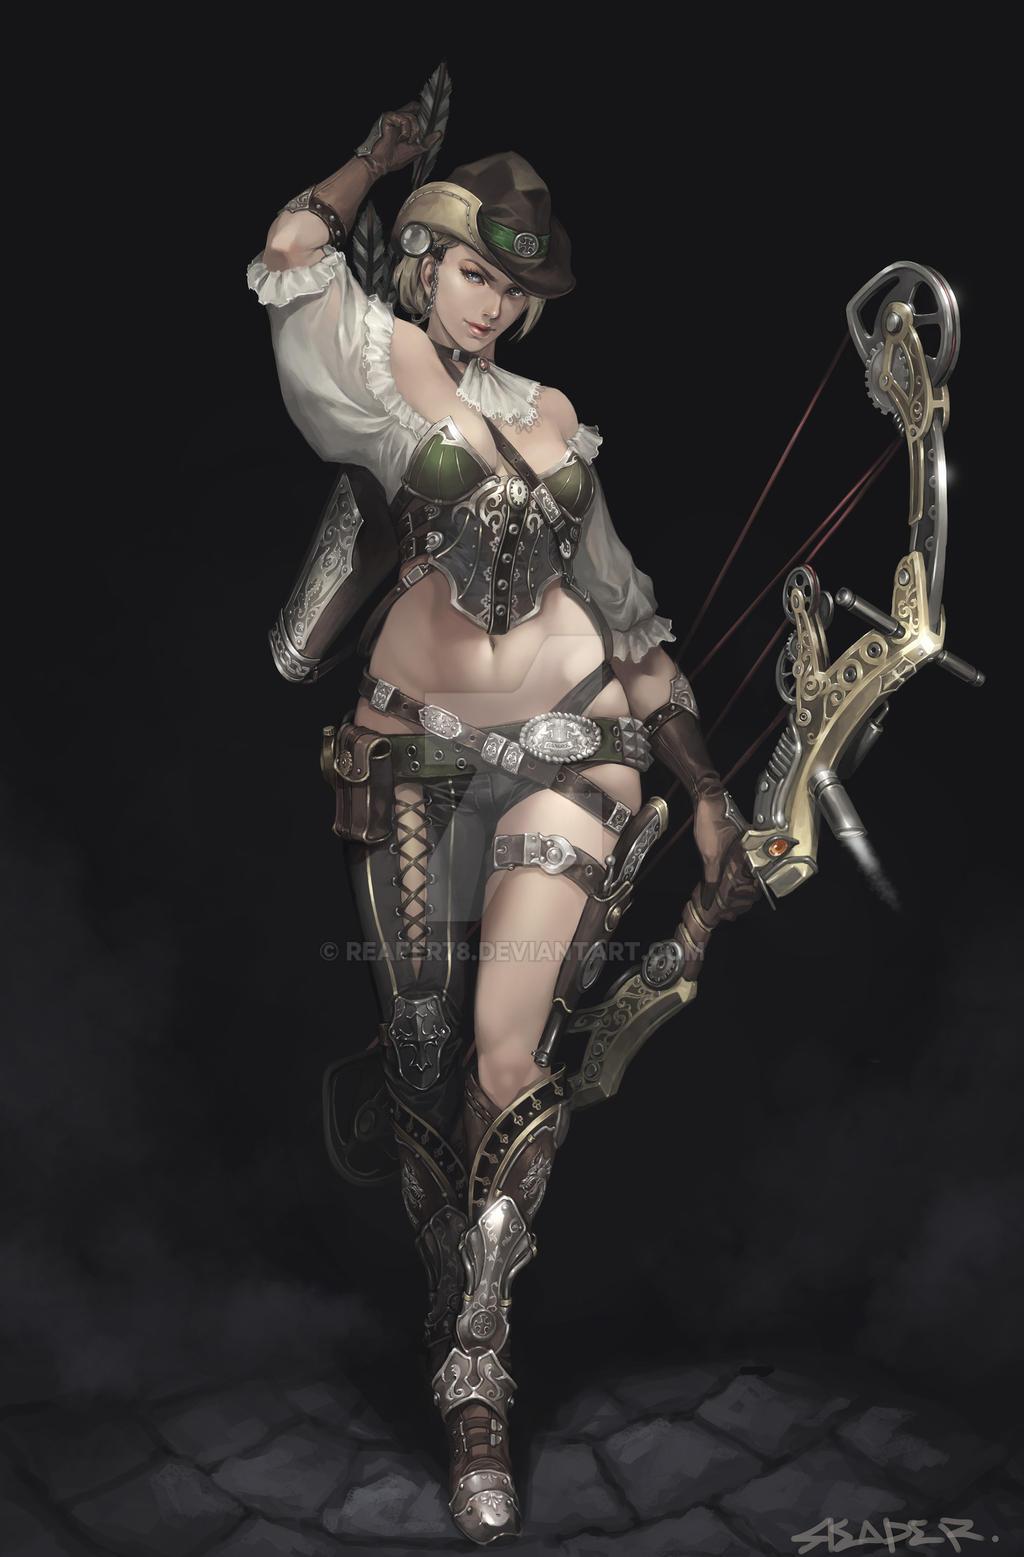 Steampunk Female Archer by reaper78